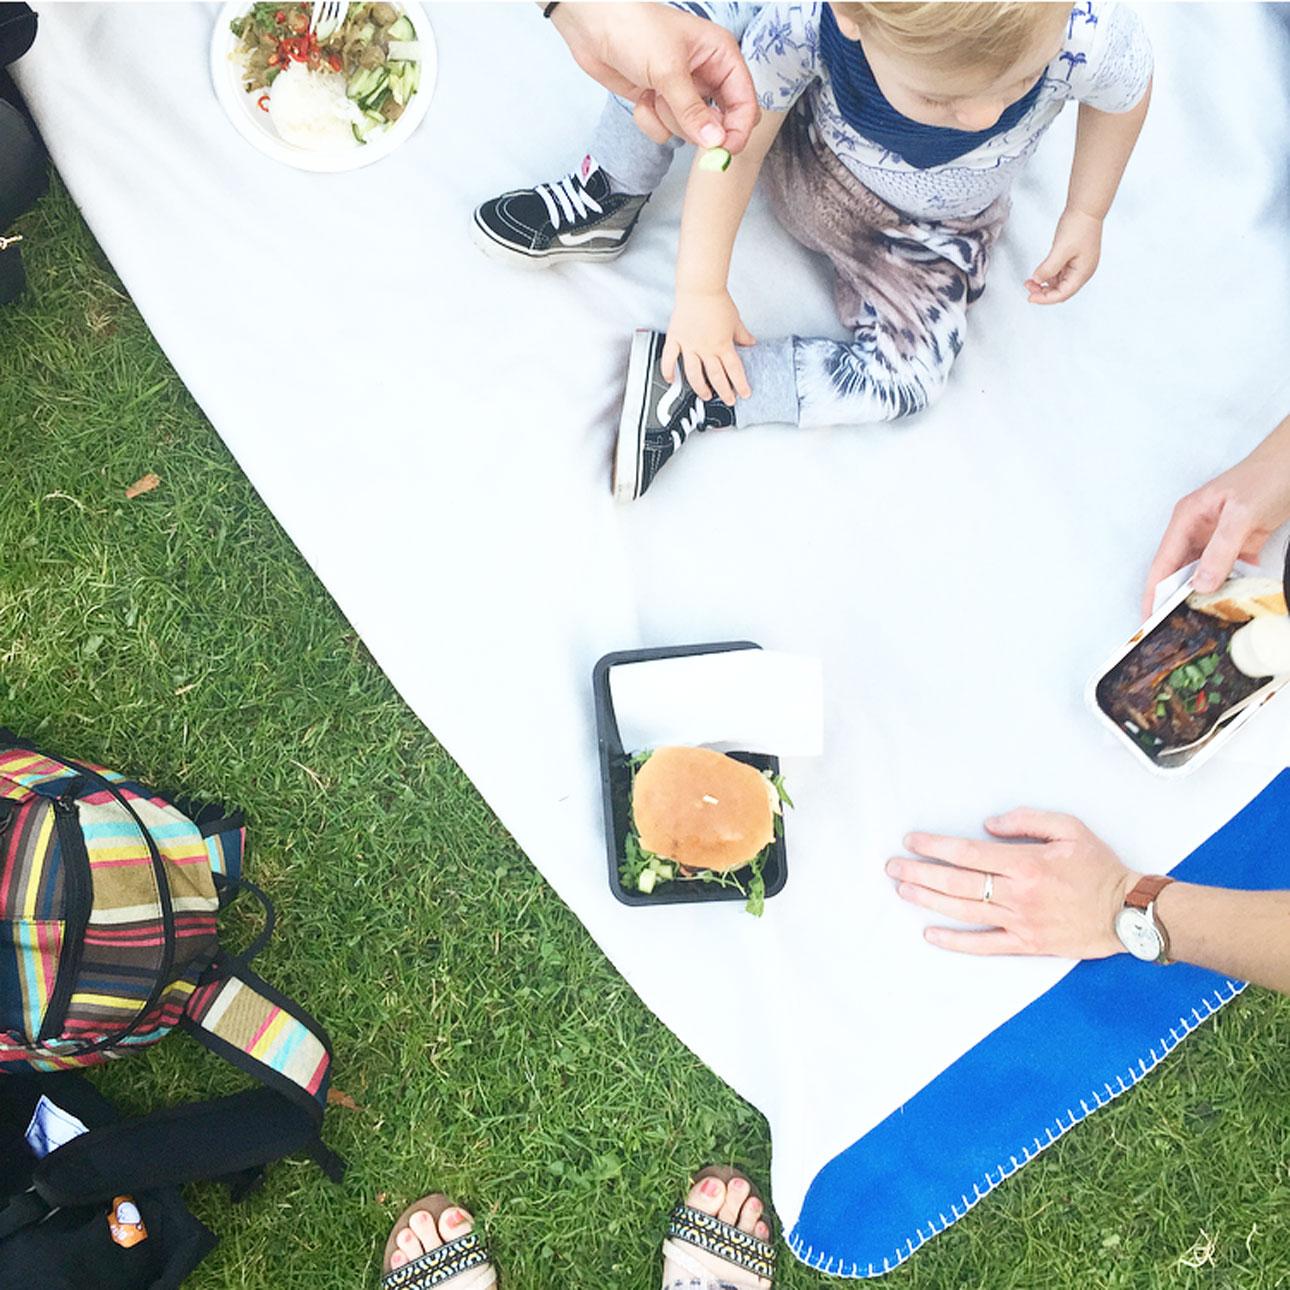 Mamalifestyle Marike augustus 2015 picnick Proefpark